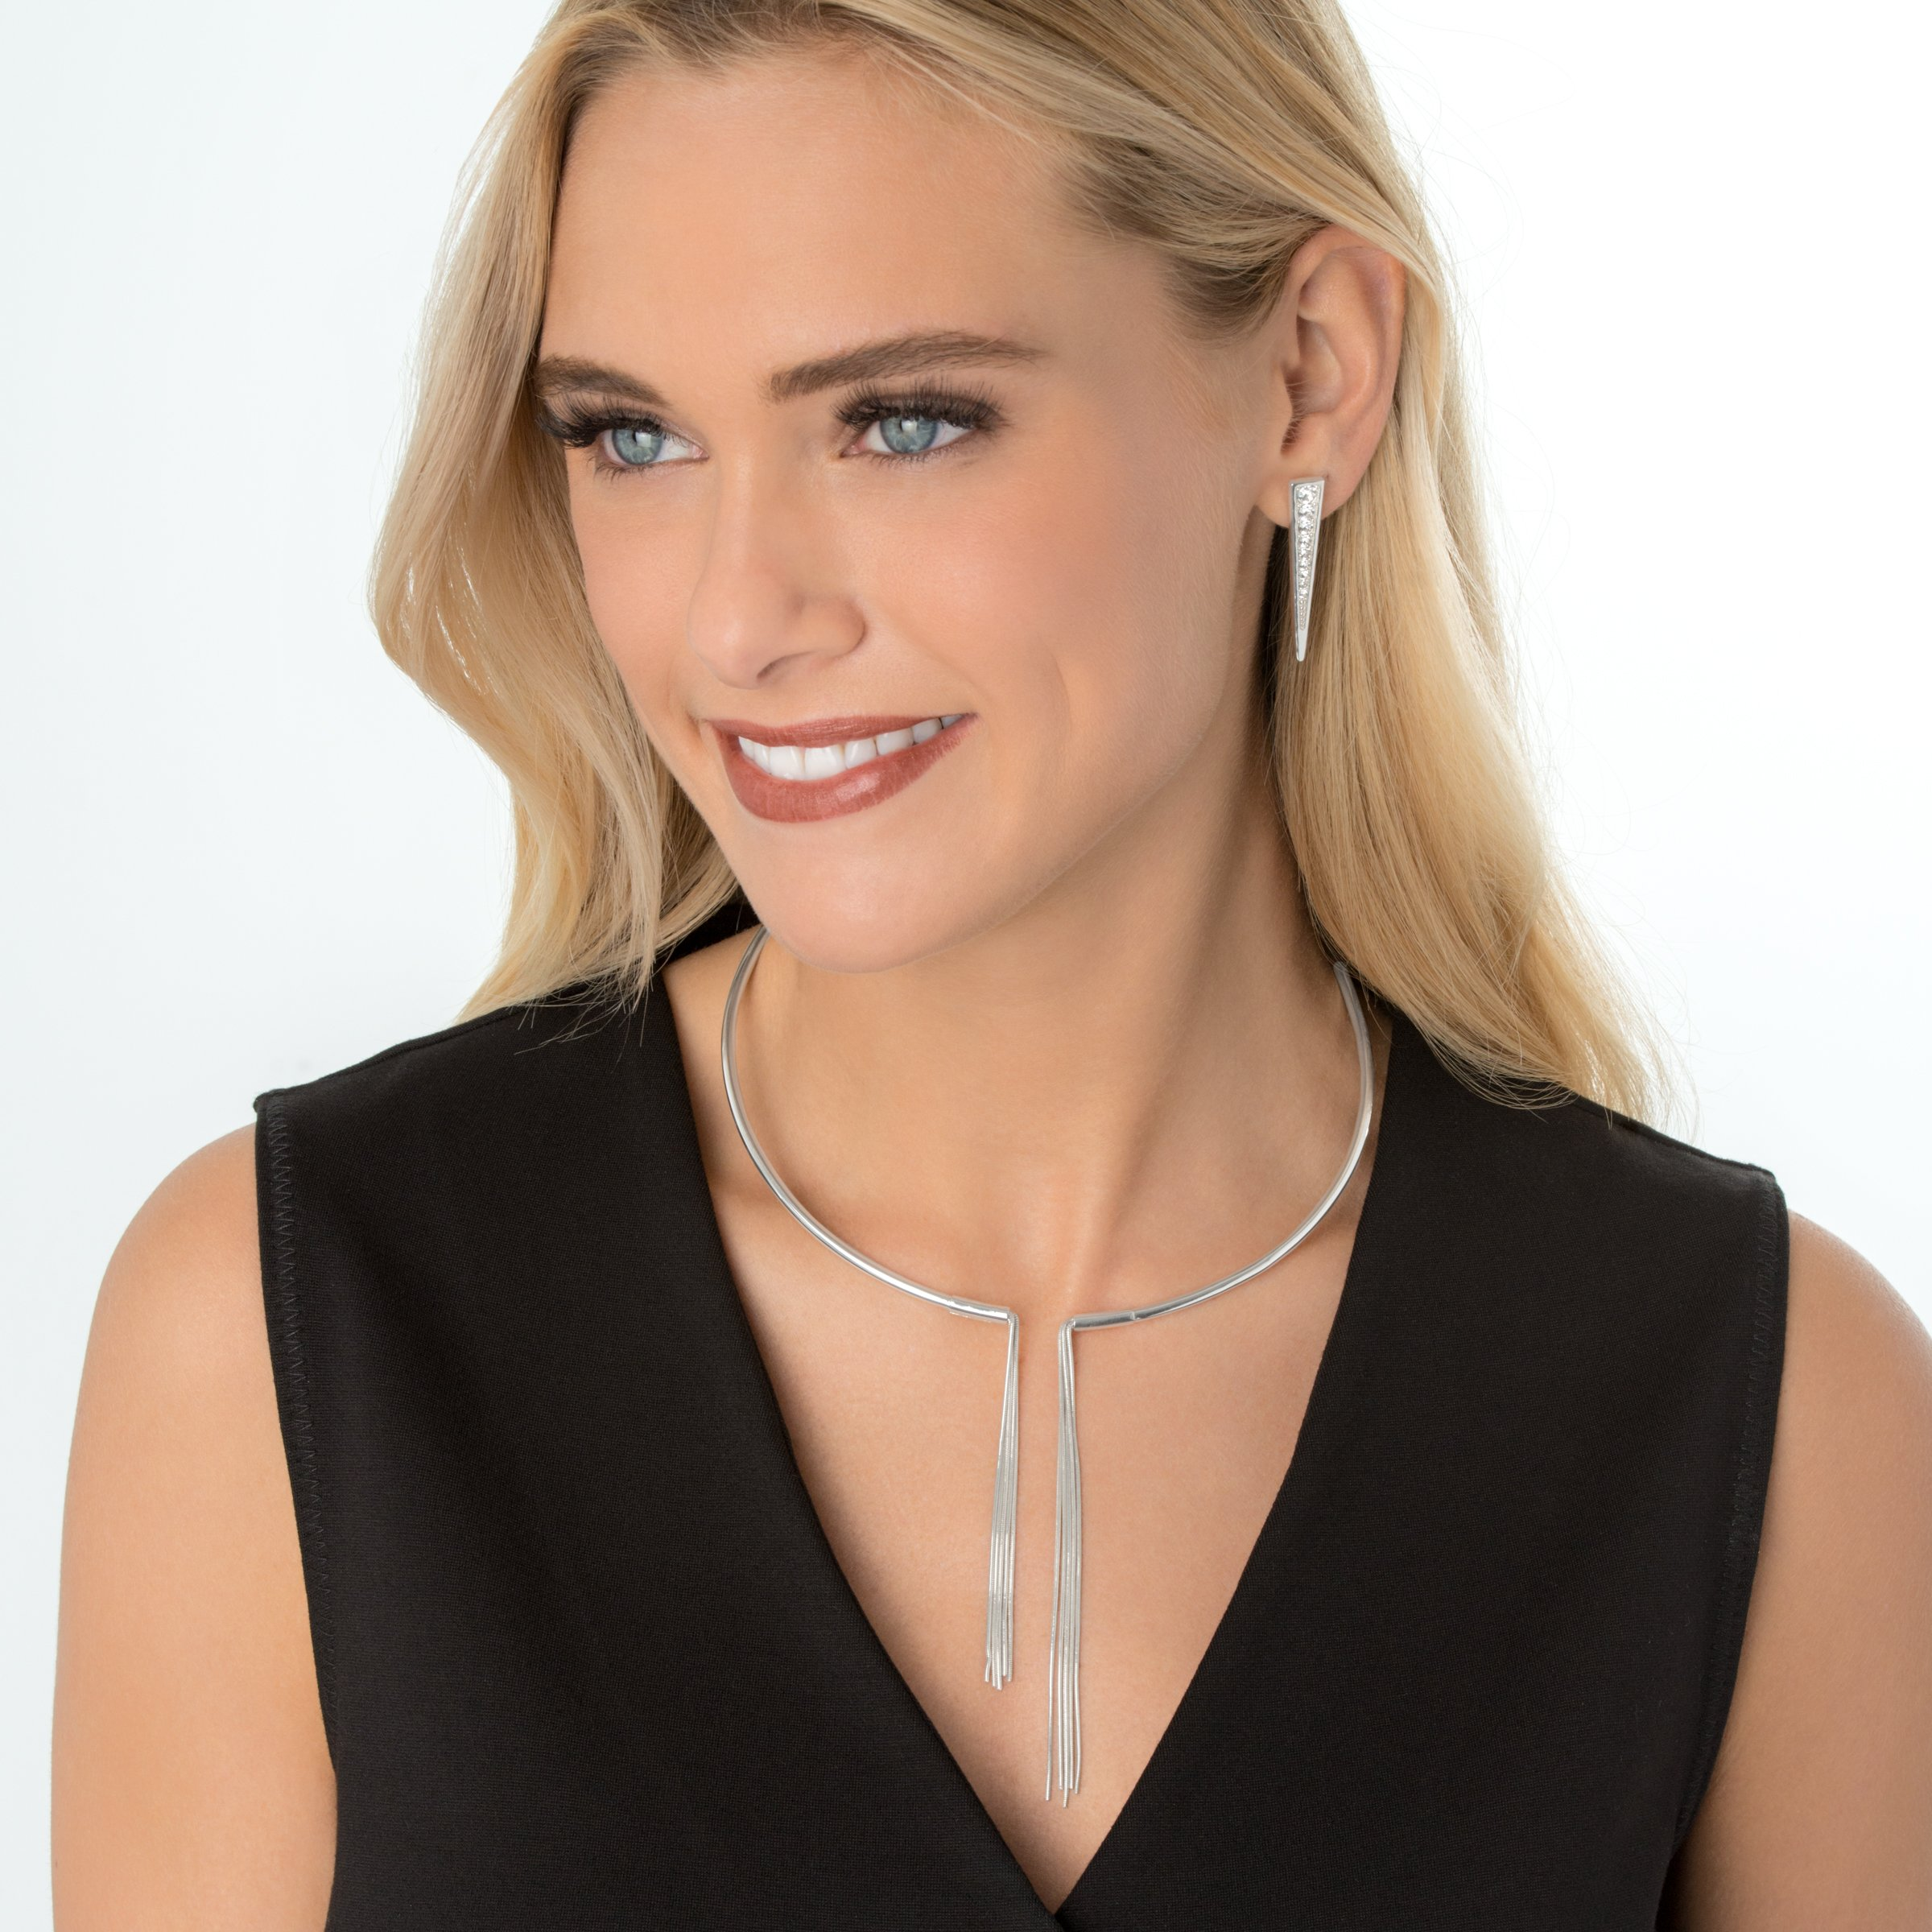 Silpada Sterling Silver Asymmetrical Collar Necklace, 16.5'' by Silpada (Image #3)